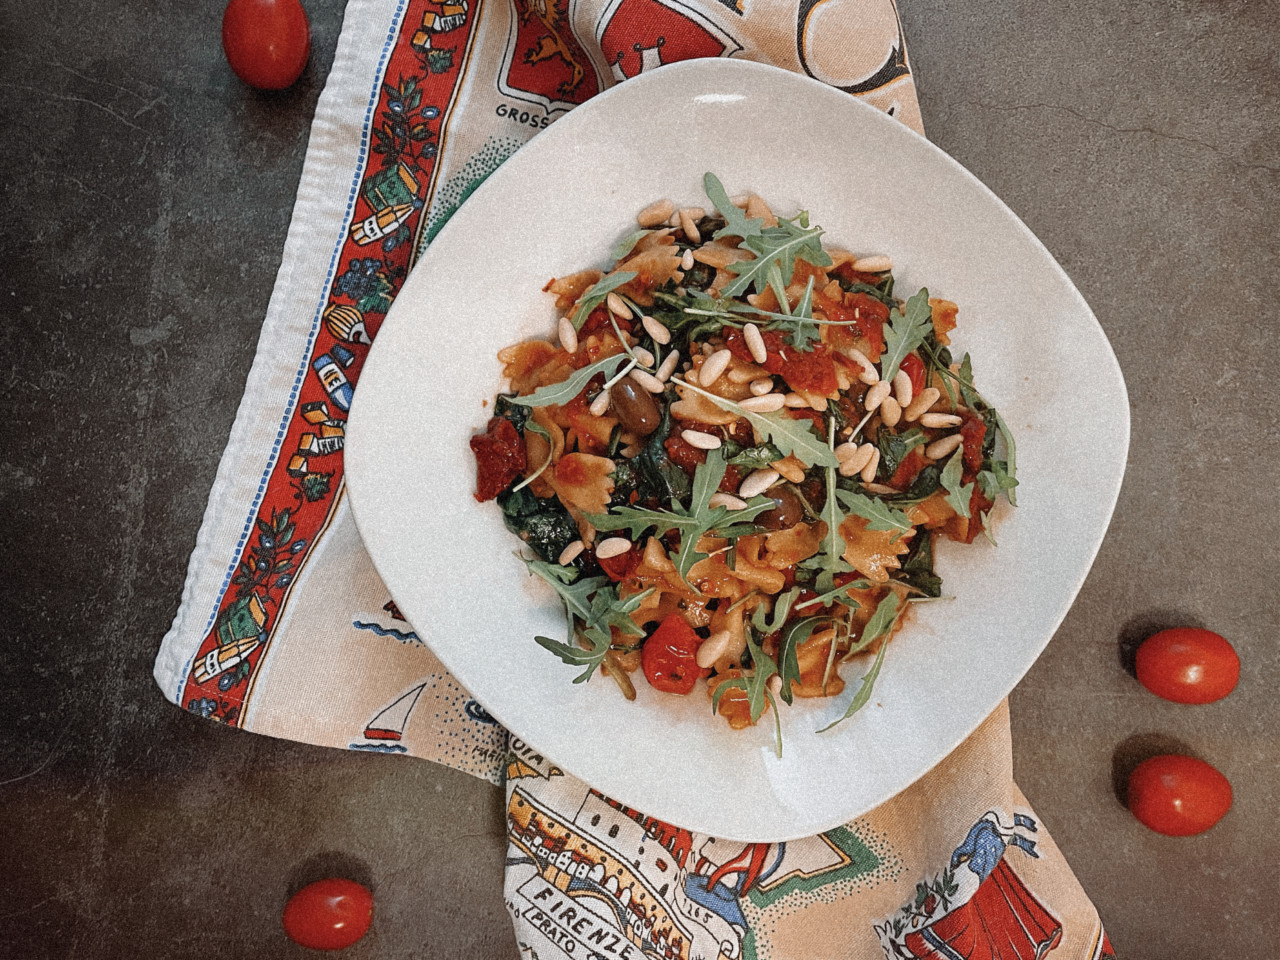 Italienischer Nudelsalat: Eine Prise Italien! Foto: Lunchgate/Selina